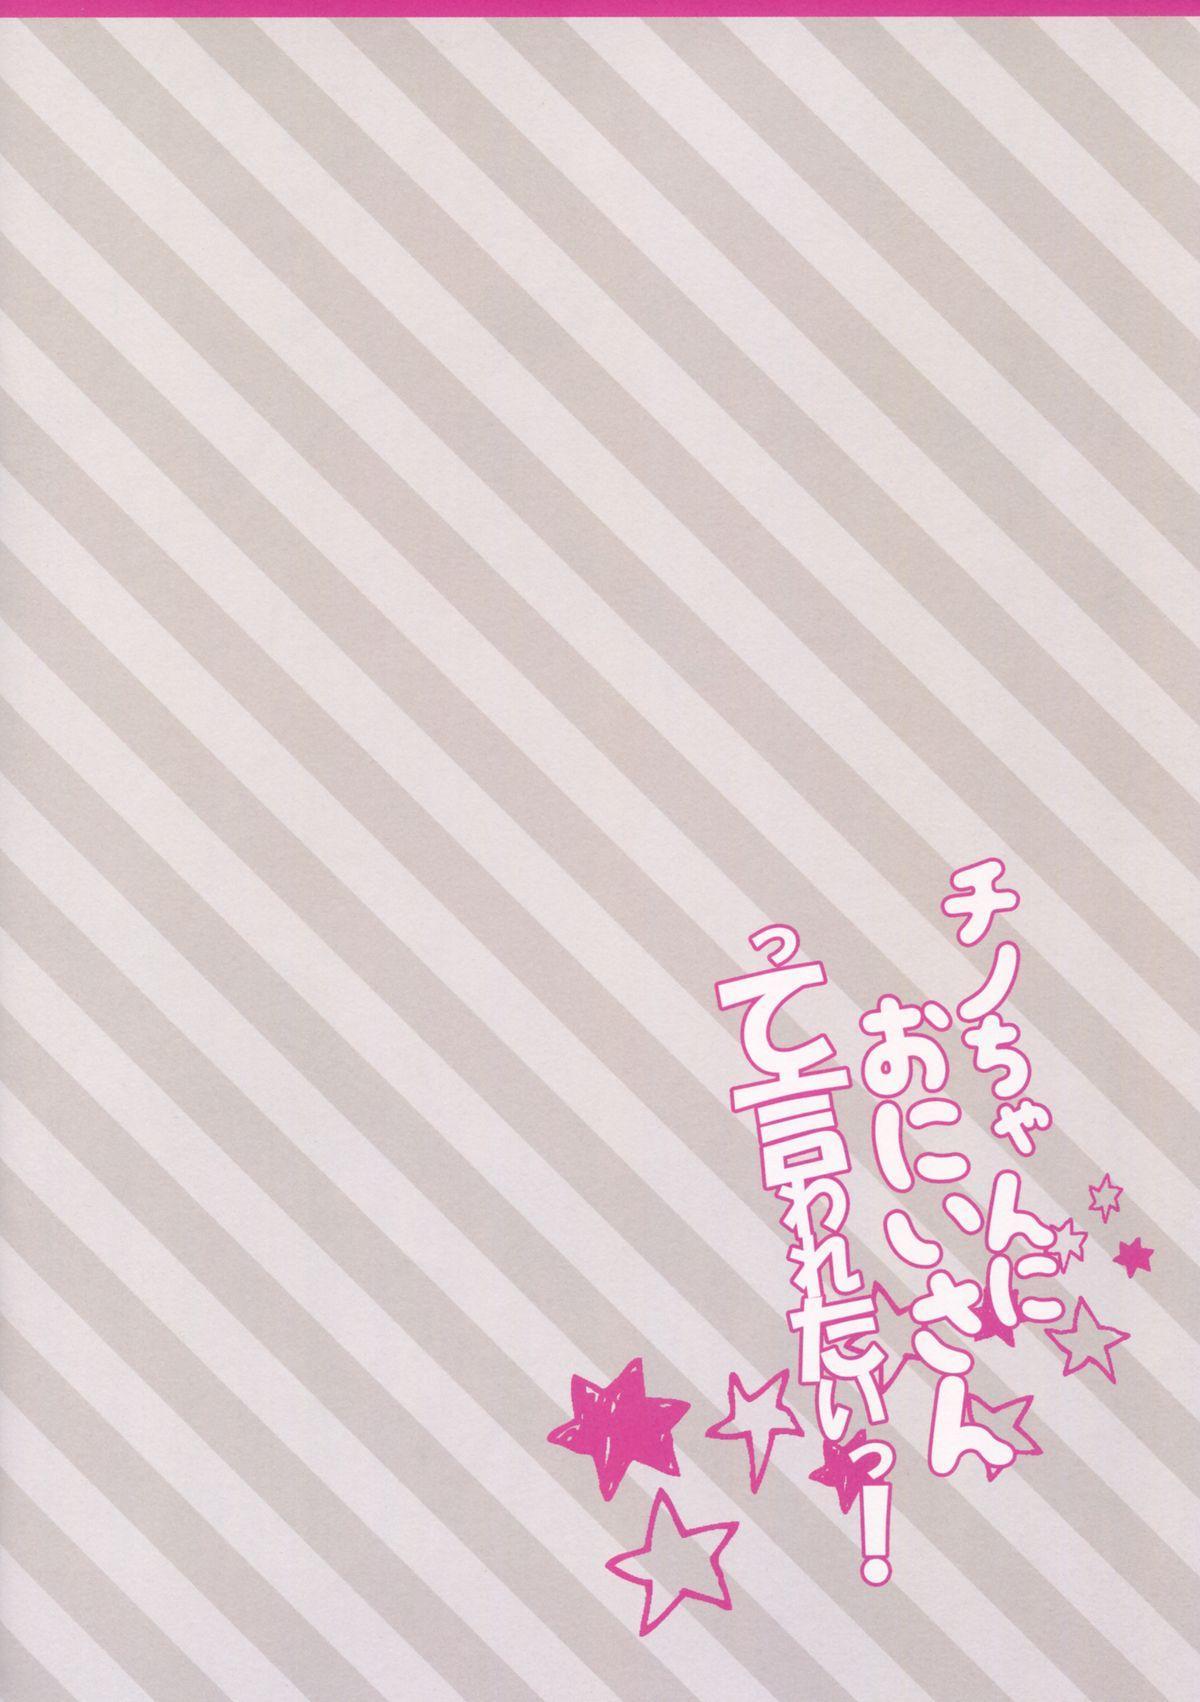 Chino-chan ni Oniisan te Iwaretai! 14